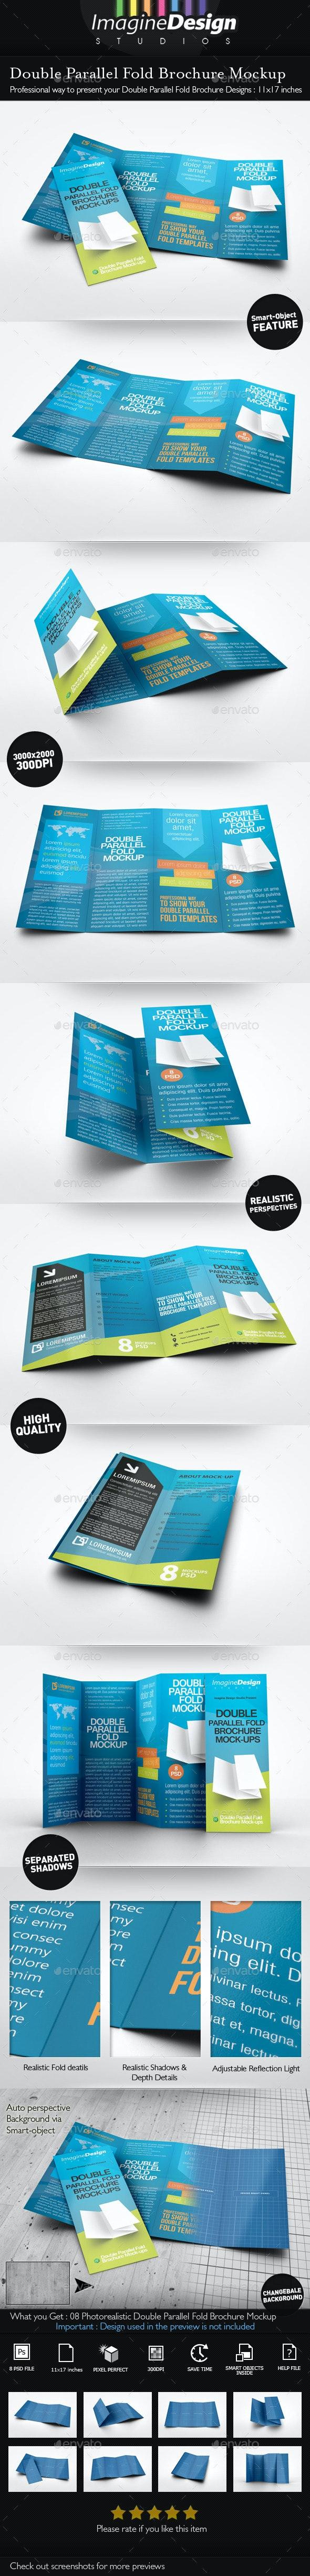 Double Parallel Fold Brochure Mockup - Brochures Print